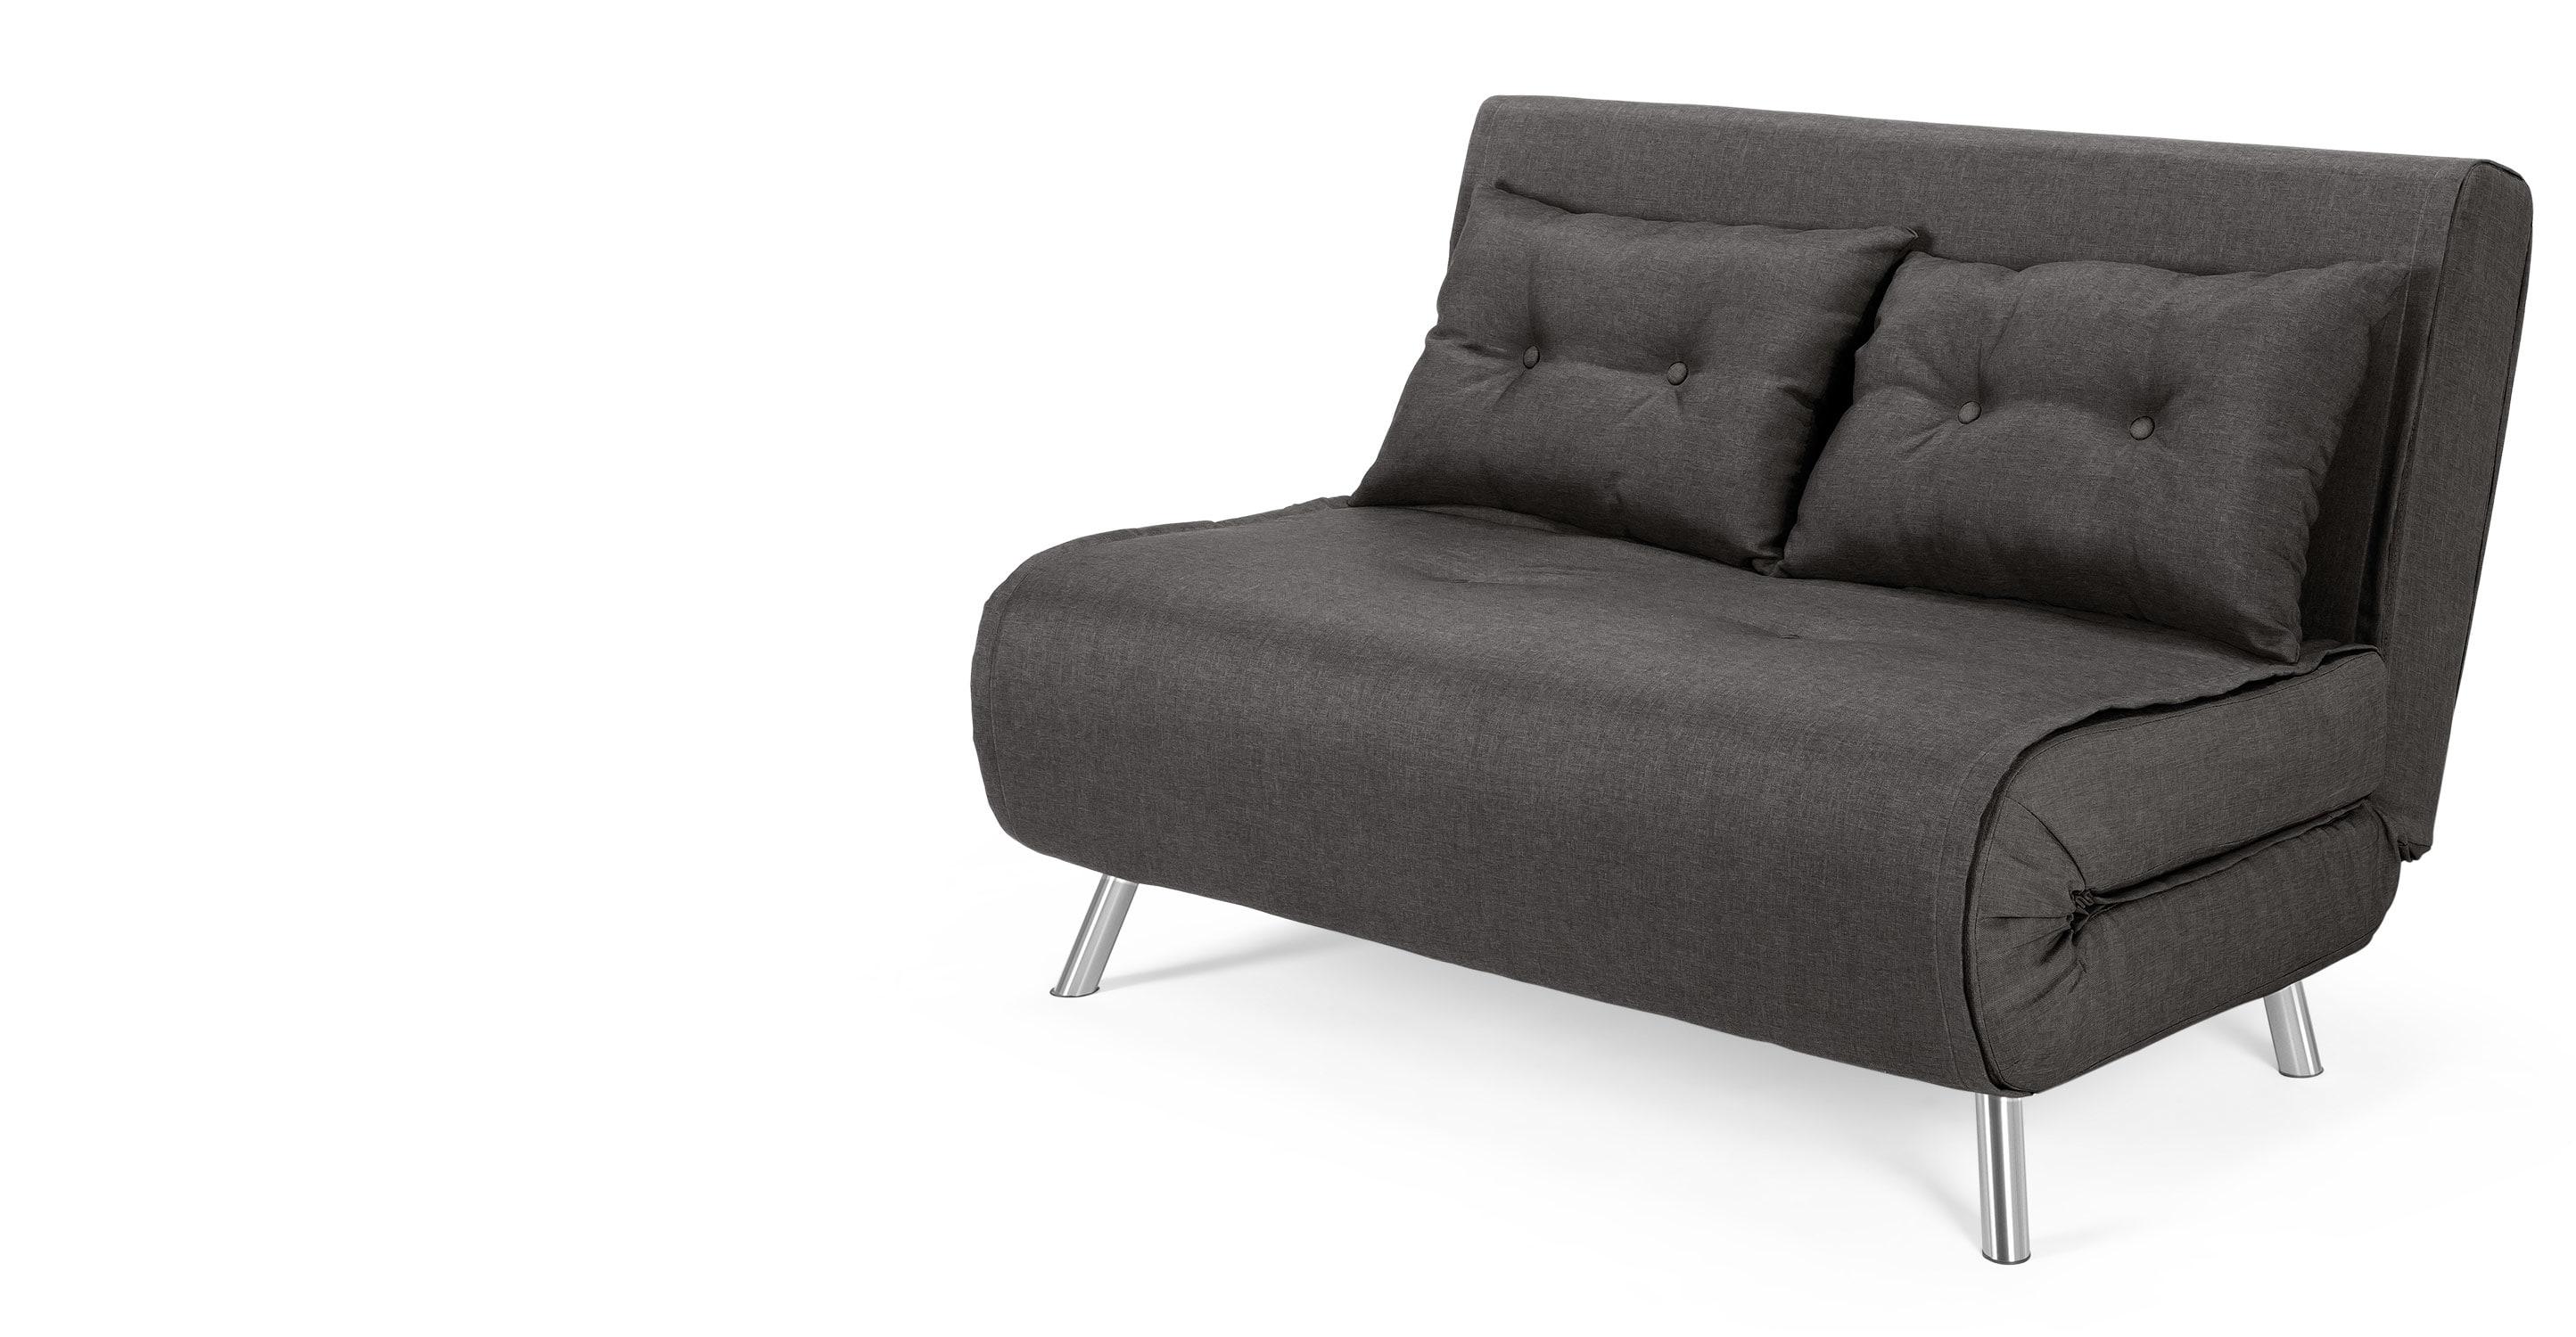 small sofa bed haru small sofabed, cygnet grey | made.com HJMTYFM